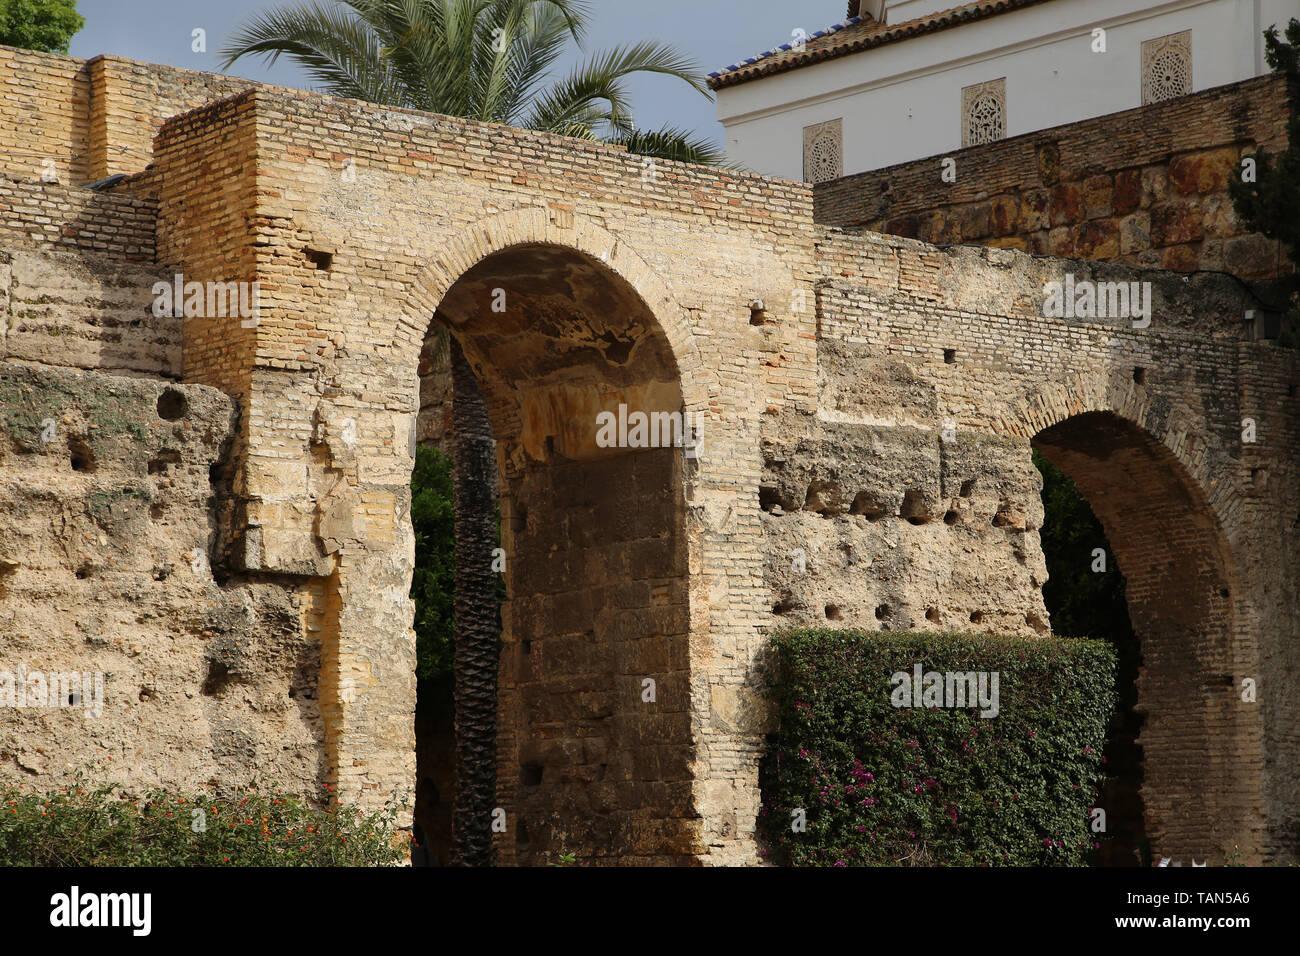 Spanien. Sevilla. Alcazar. Patio de la Monteria (Die Jagd Innenhof). Alte Mauern. Stockbild